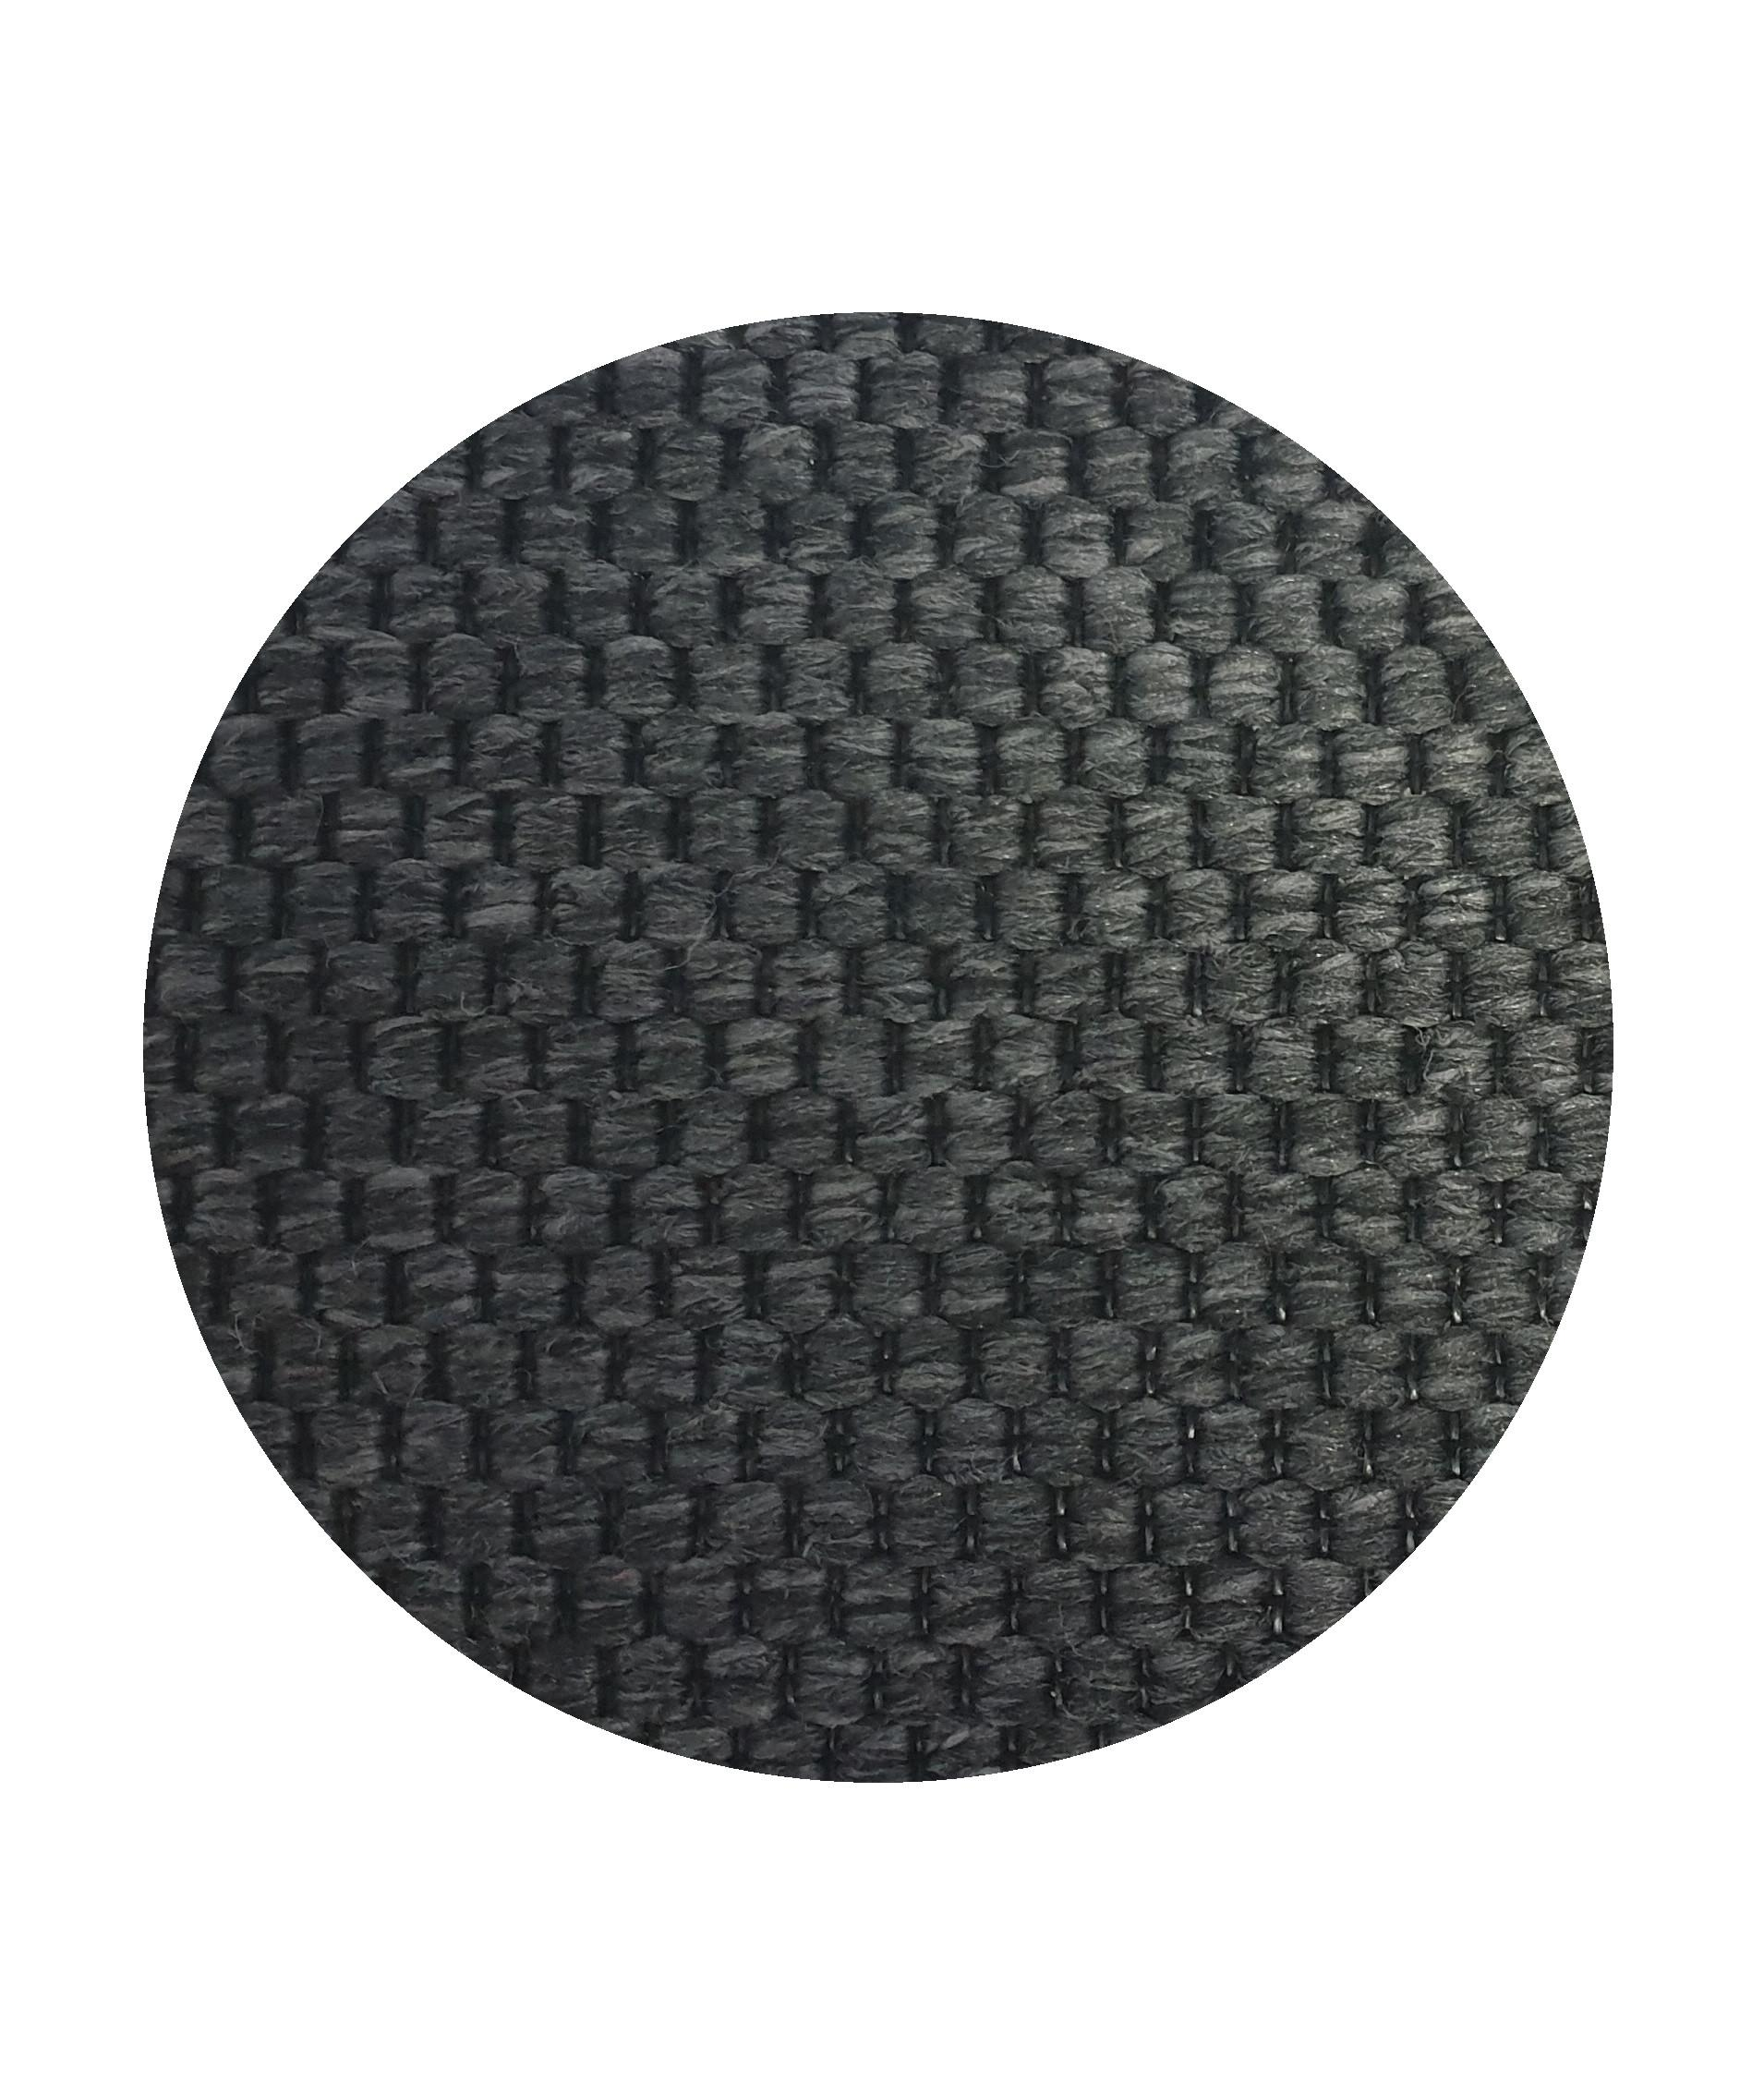 Vopi koberce Kusový koberec Nature antracit kulatý - 400x400 (průměr) kruh cm